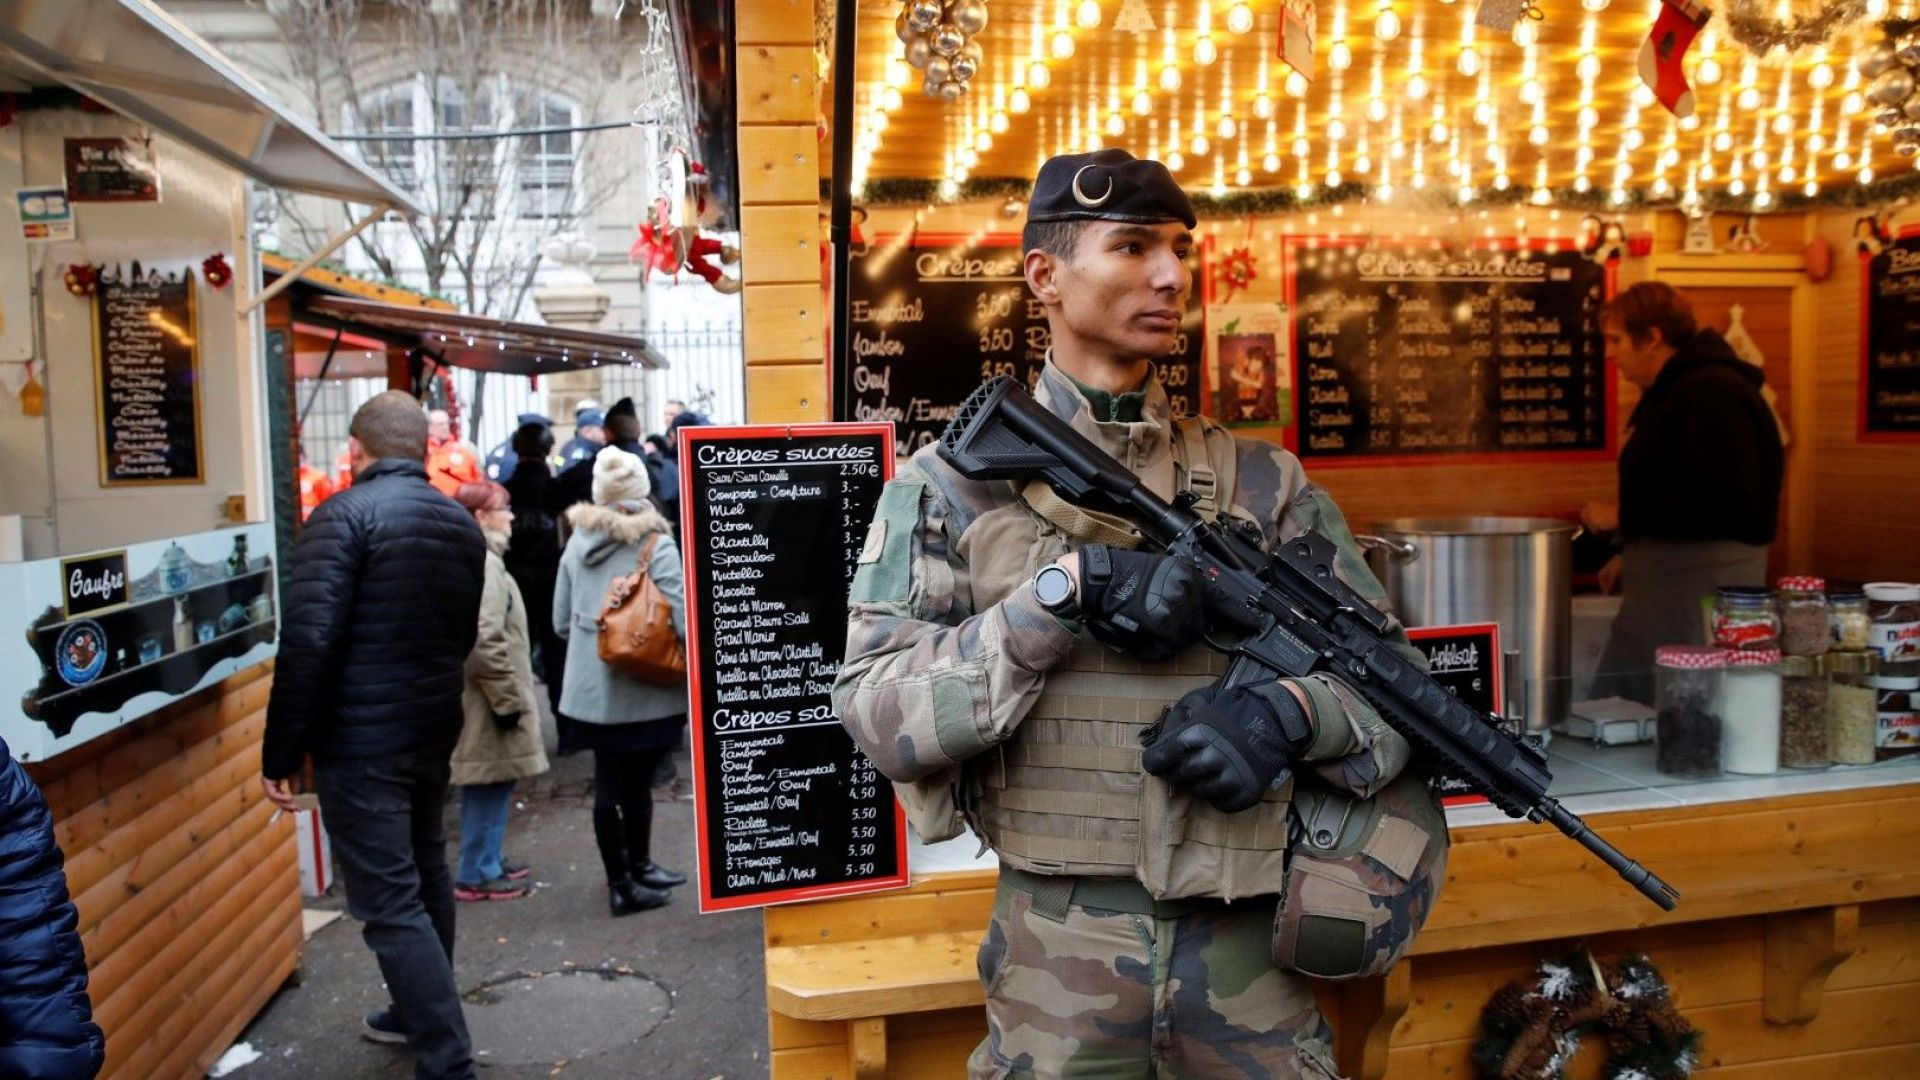 Италиански журналист е сред жертвите на терориста от Страсбург, предадоха